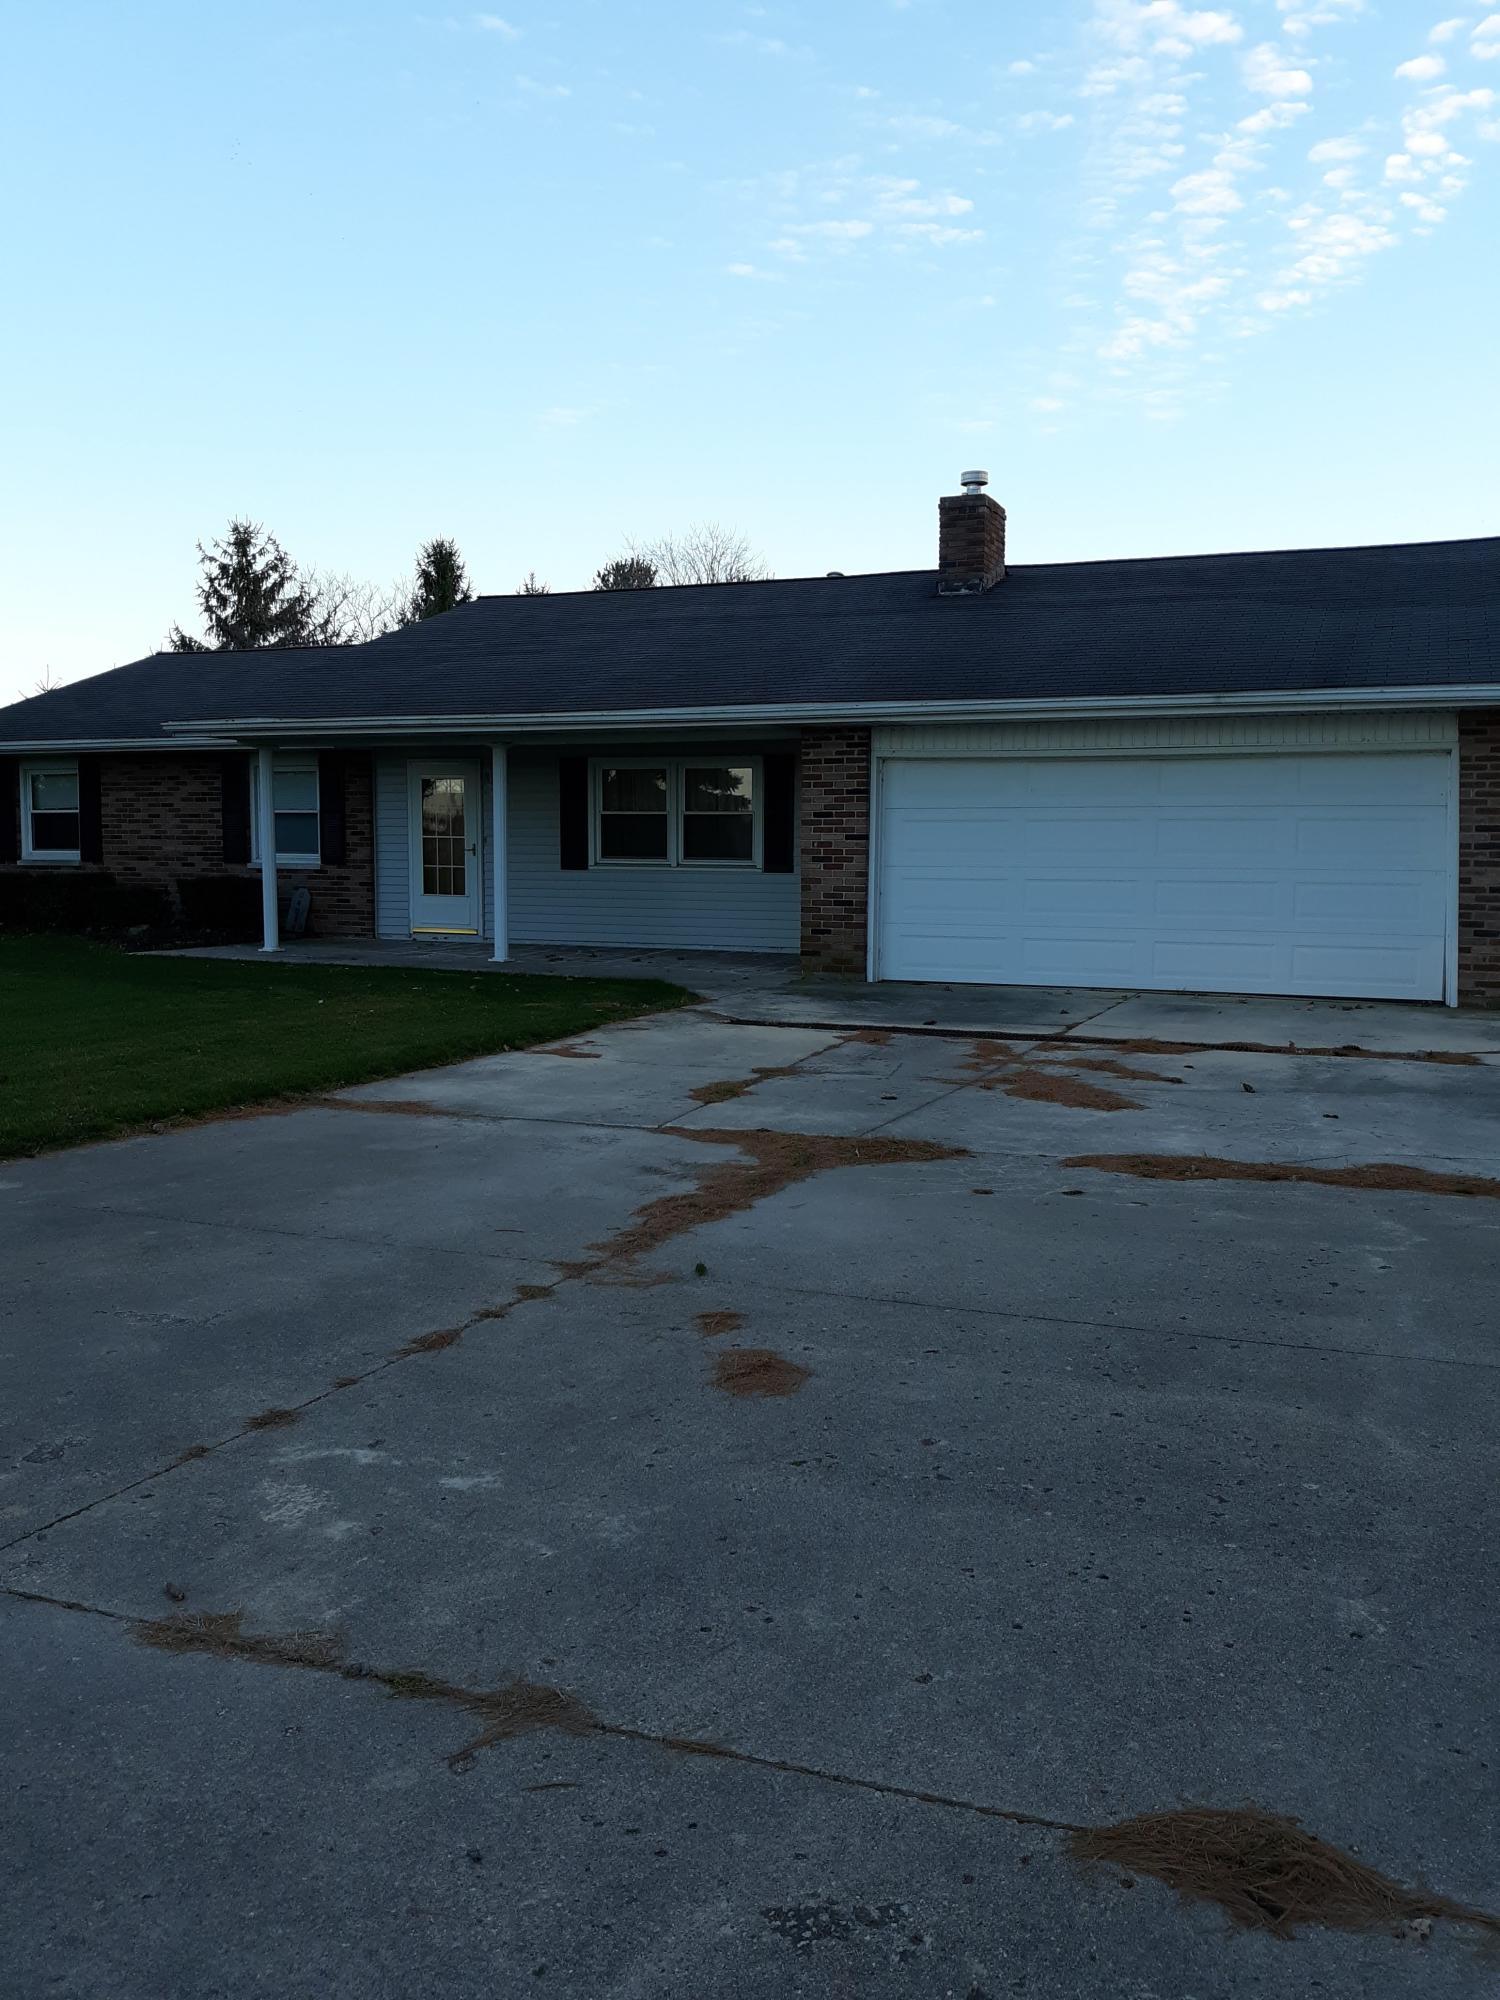 4030 Quellhorst Property Photo - Saint Marys, OH real estate listing